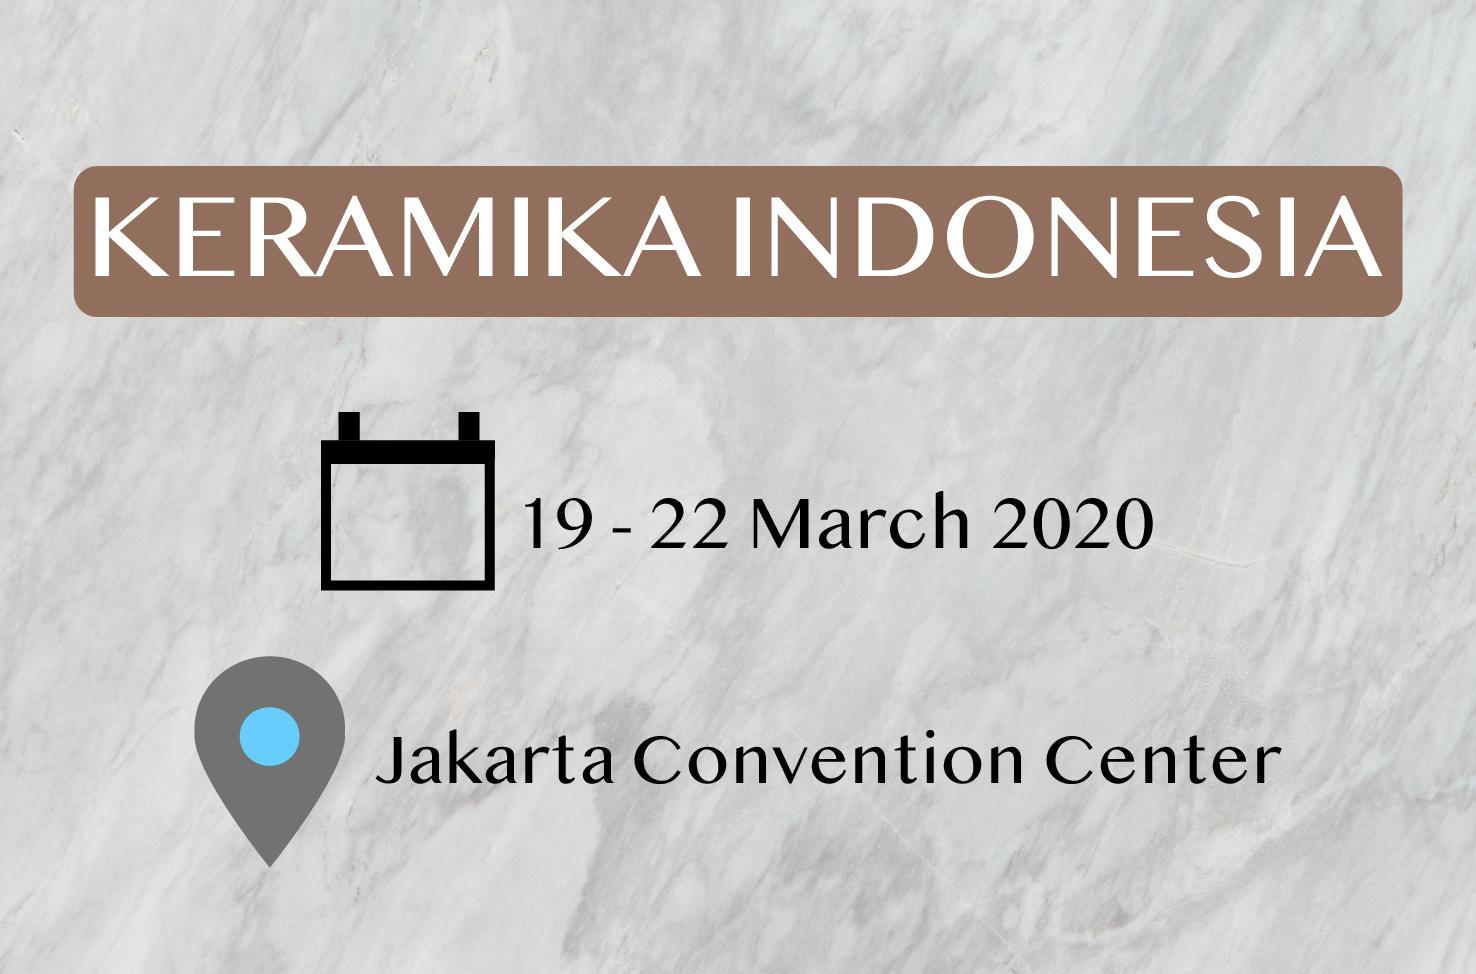 Keramika Indonesia, 19-22 Maret 2020 di JCC